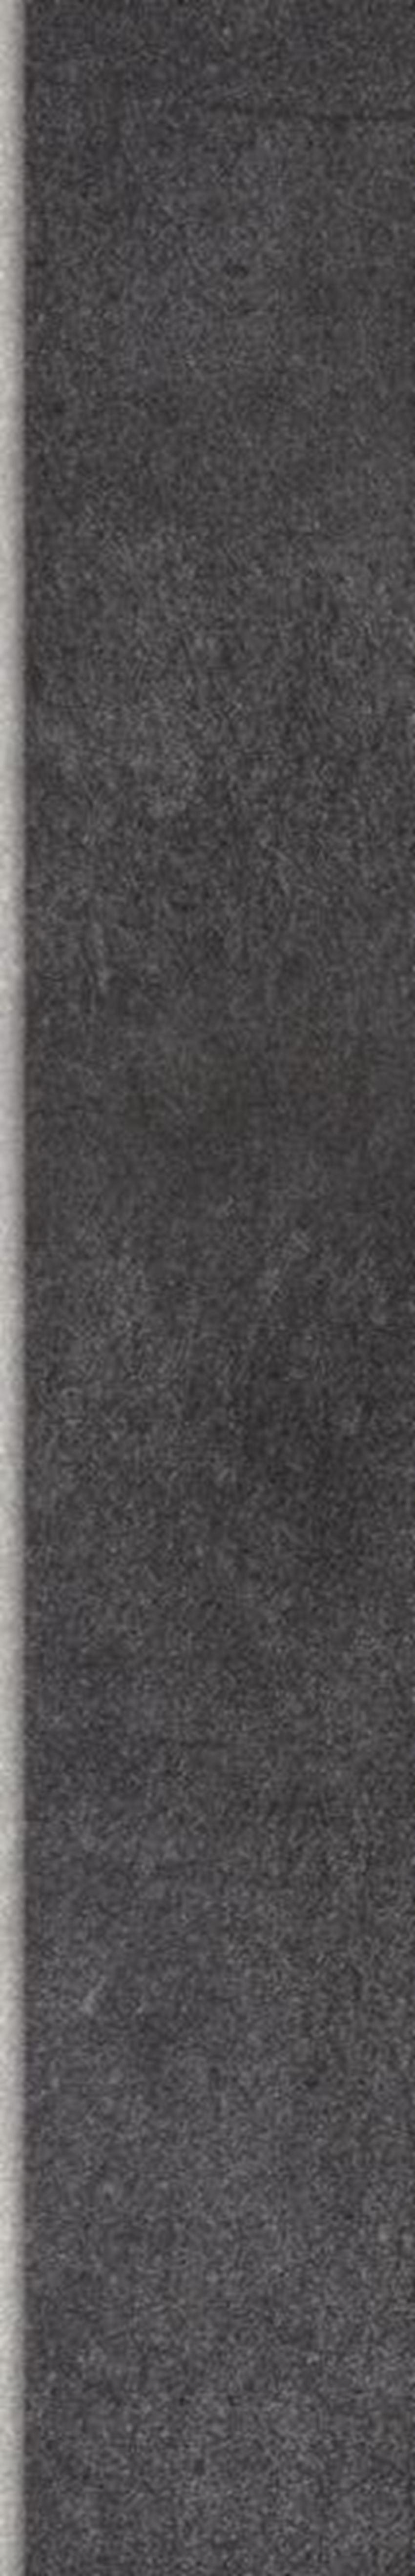 Płytka cokołowa 7,2x44,8 cm  Paradyż Taranto Grafit Cokół Mat